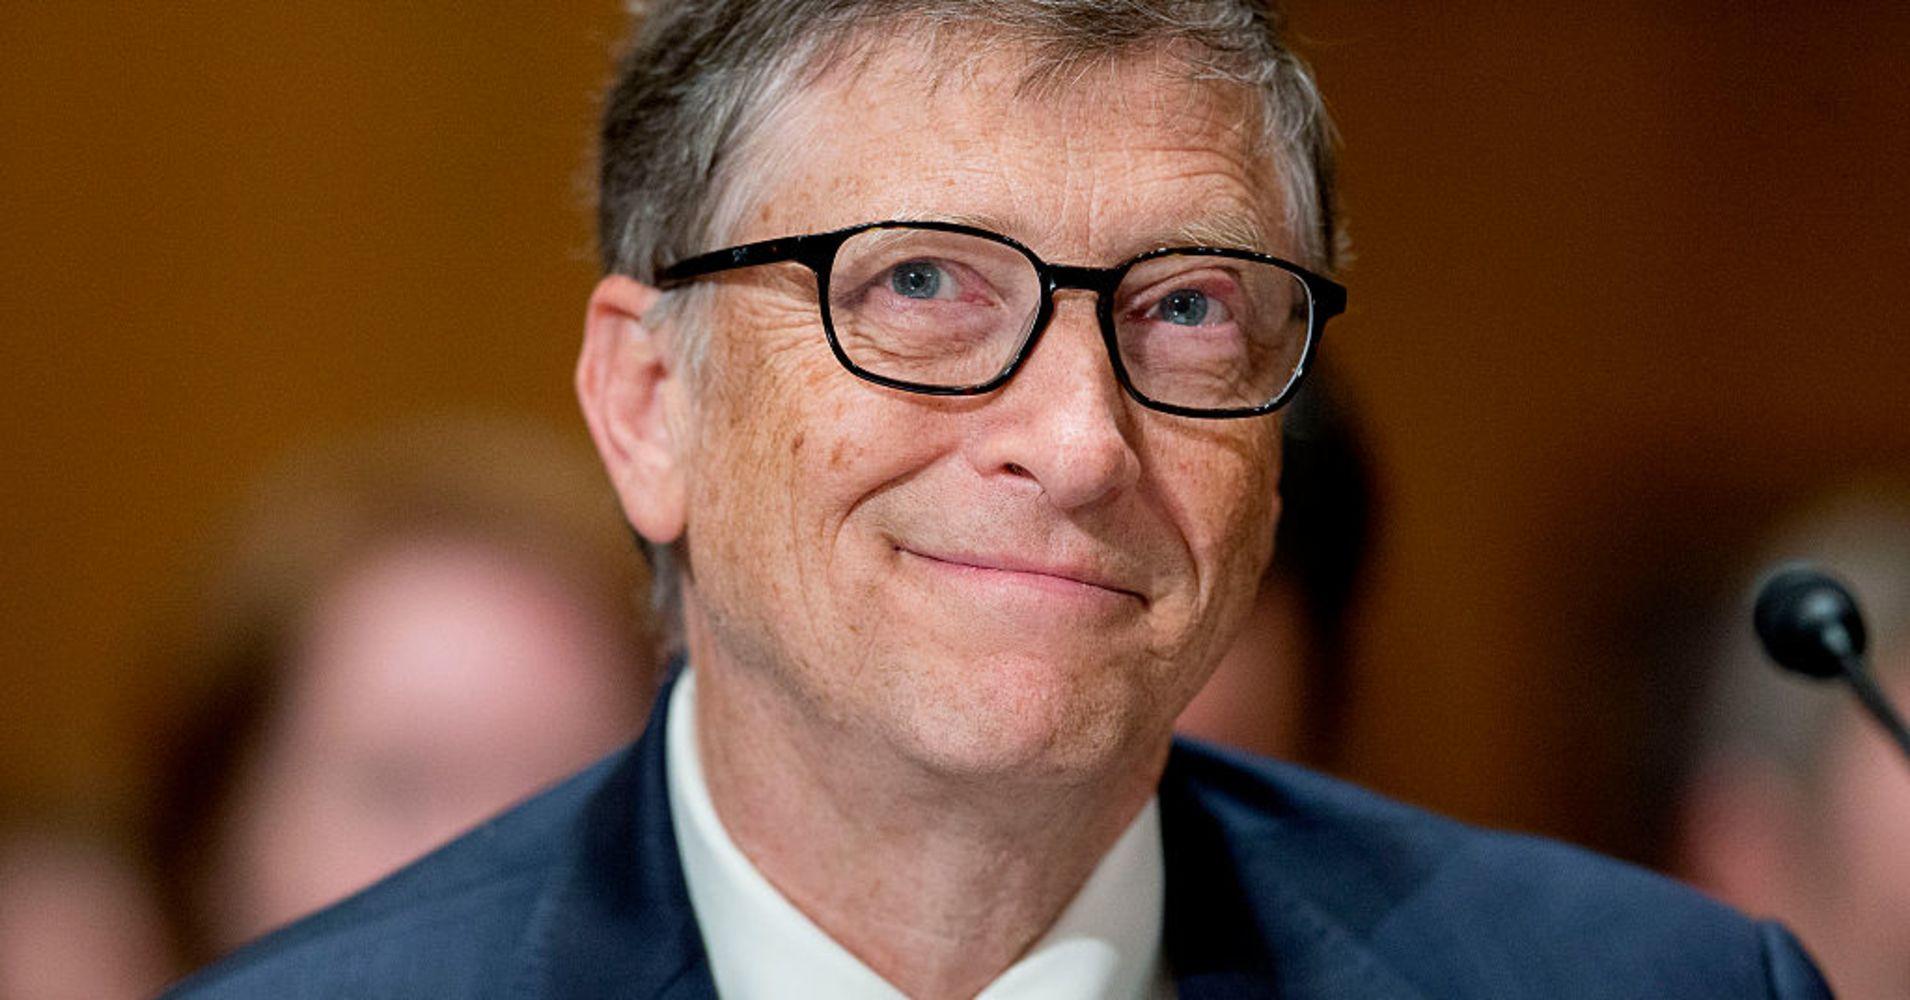 Bill Gates, Founder of Microsoft